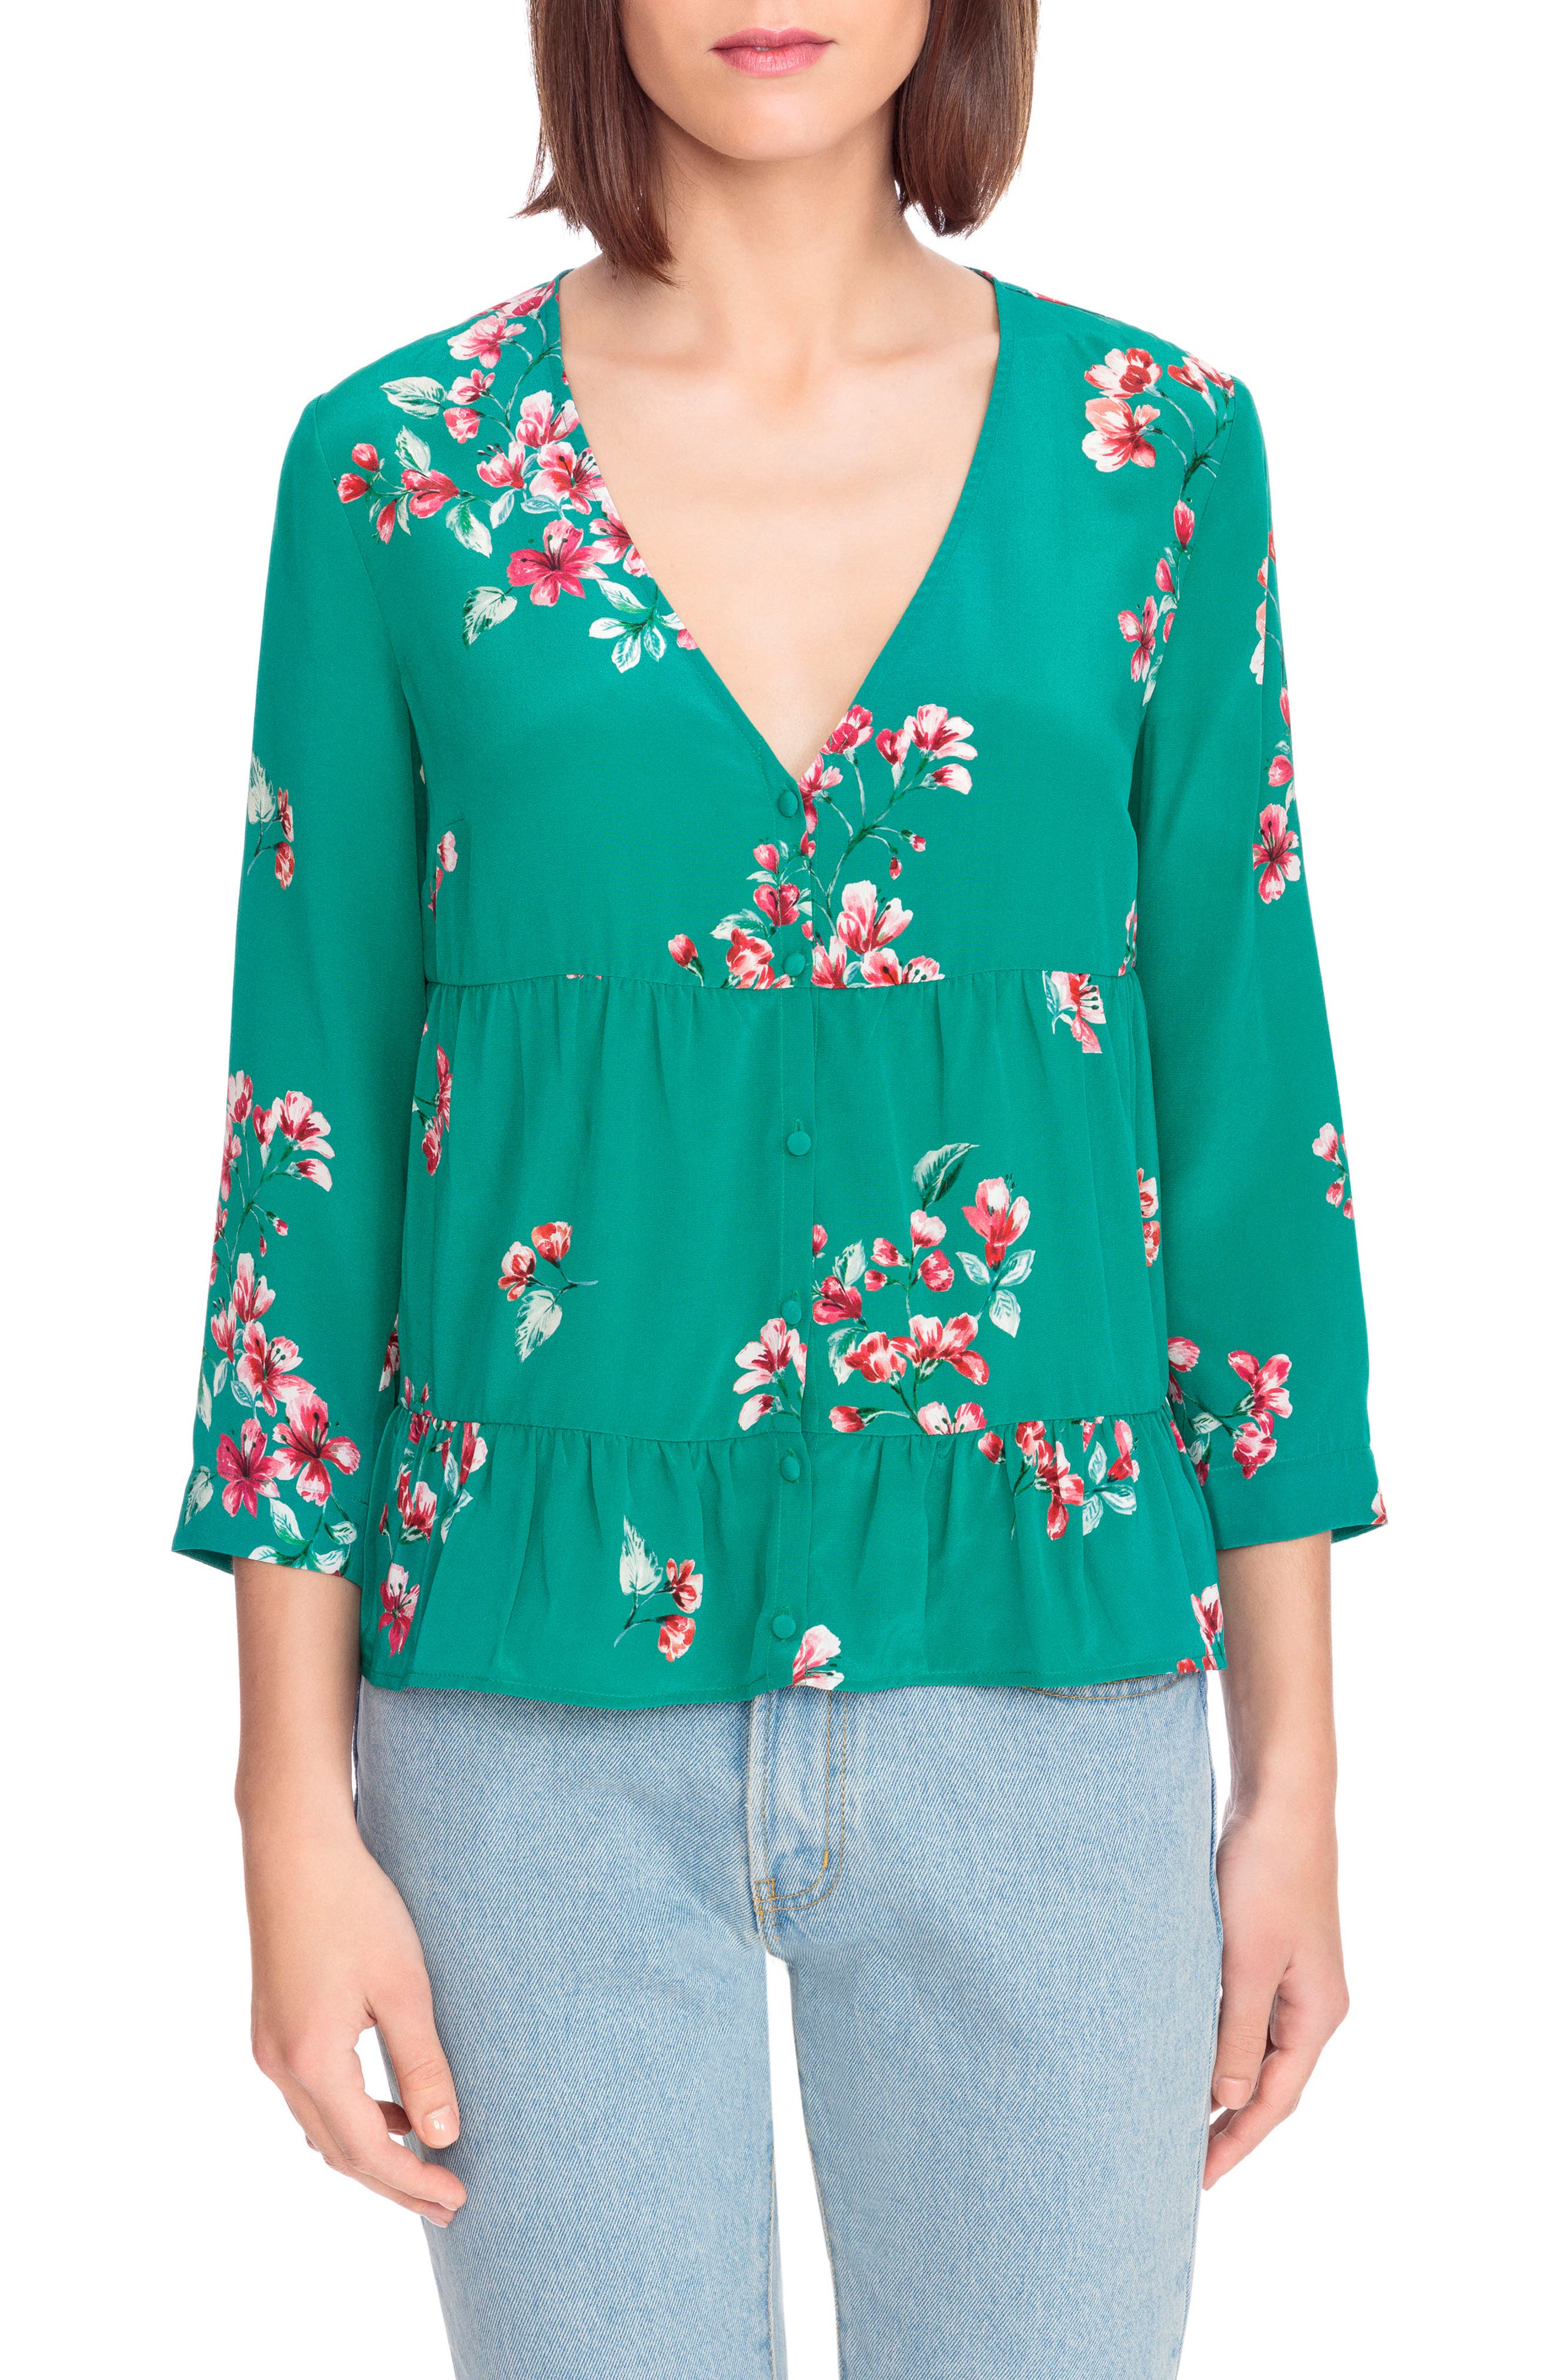 Anna Floral Silk Blouse,                             Main thumbnail 1, color,                             Bouquet Print On Green